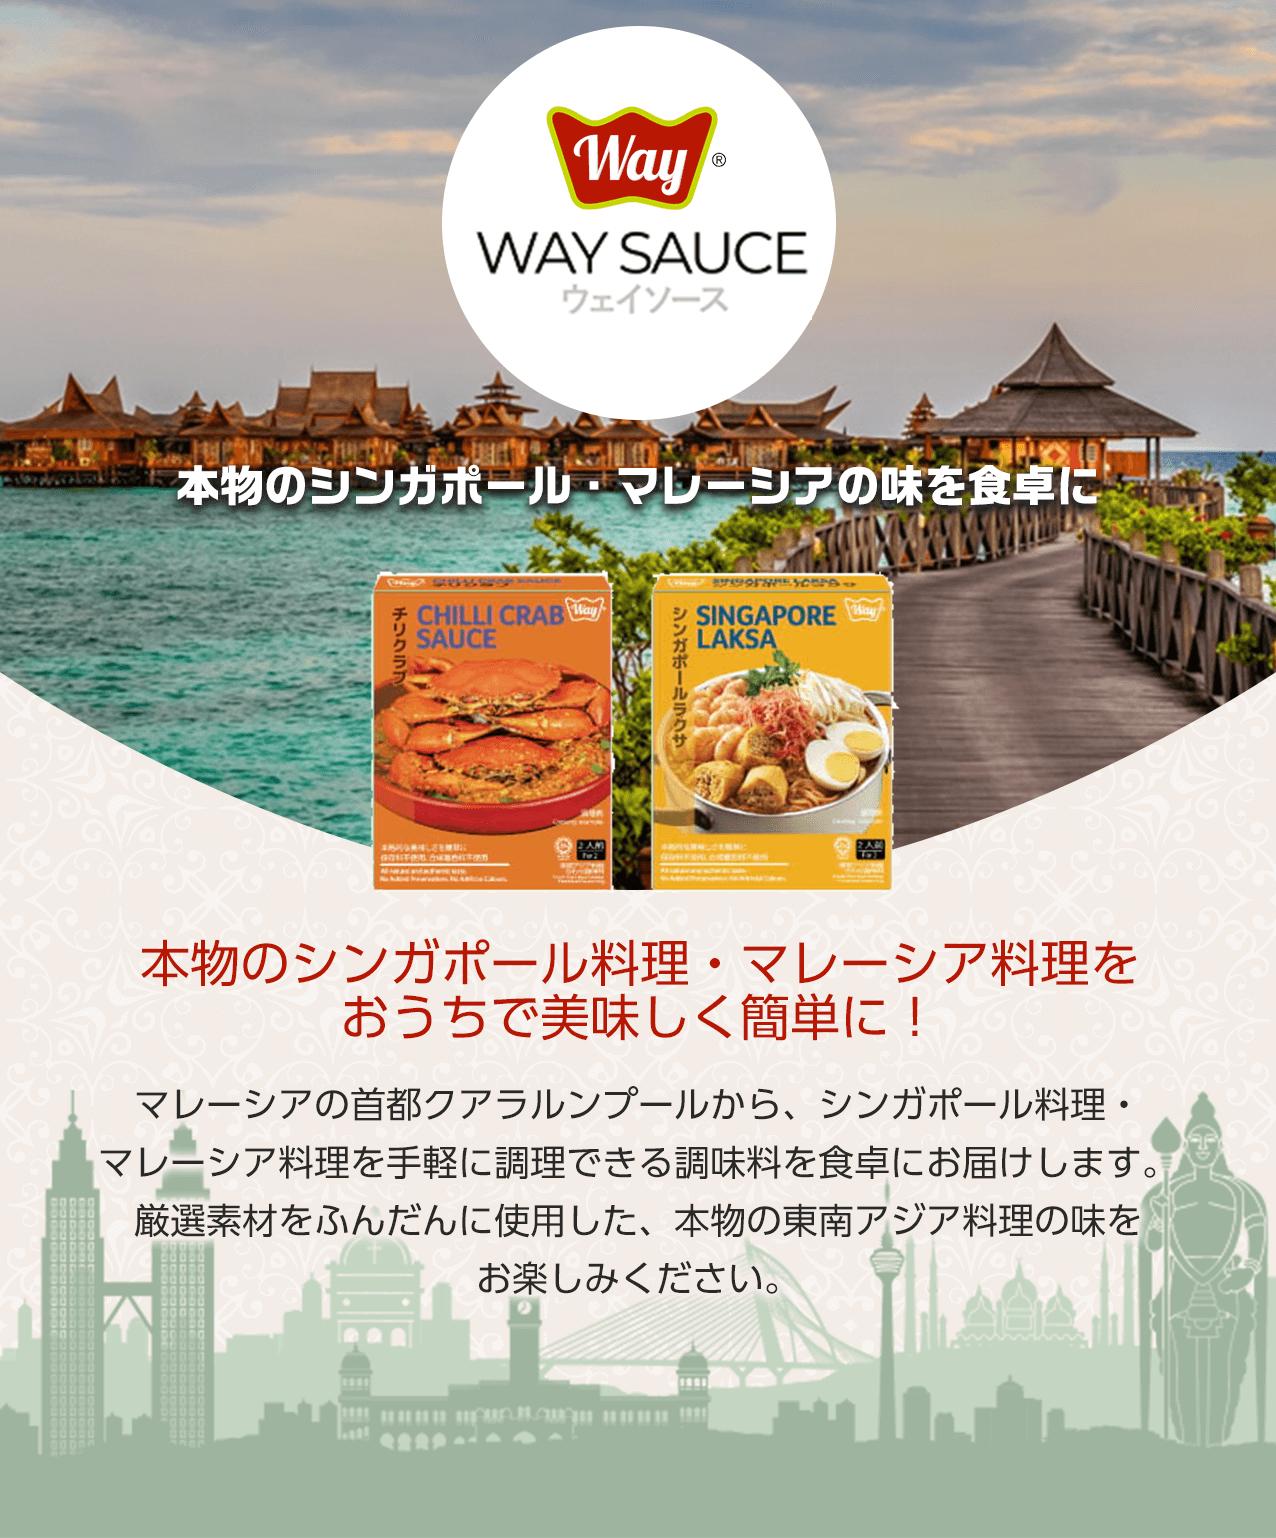 WAY SAUSE 本物のシンガポール・マレーシアの味を食卓に本物のシンガポール・マレーシアの味を食卓に